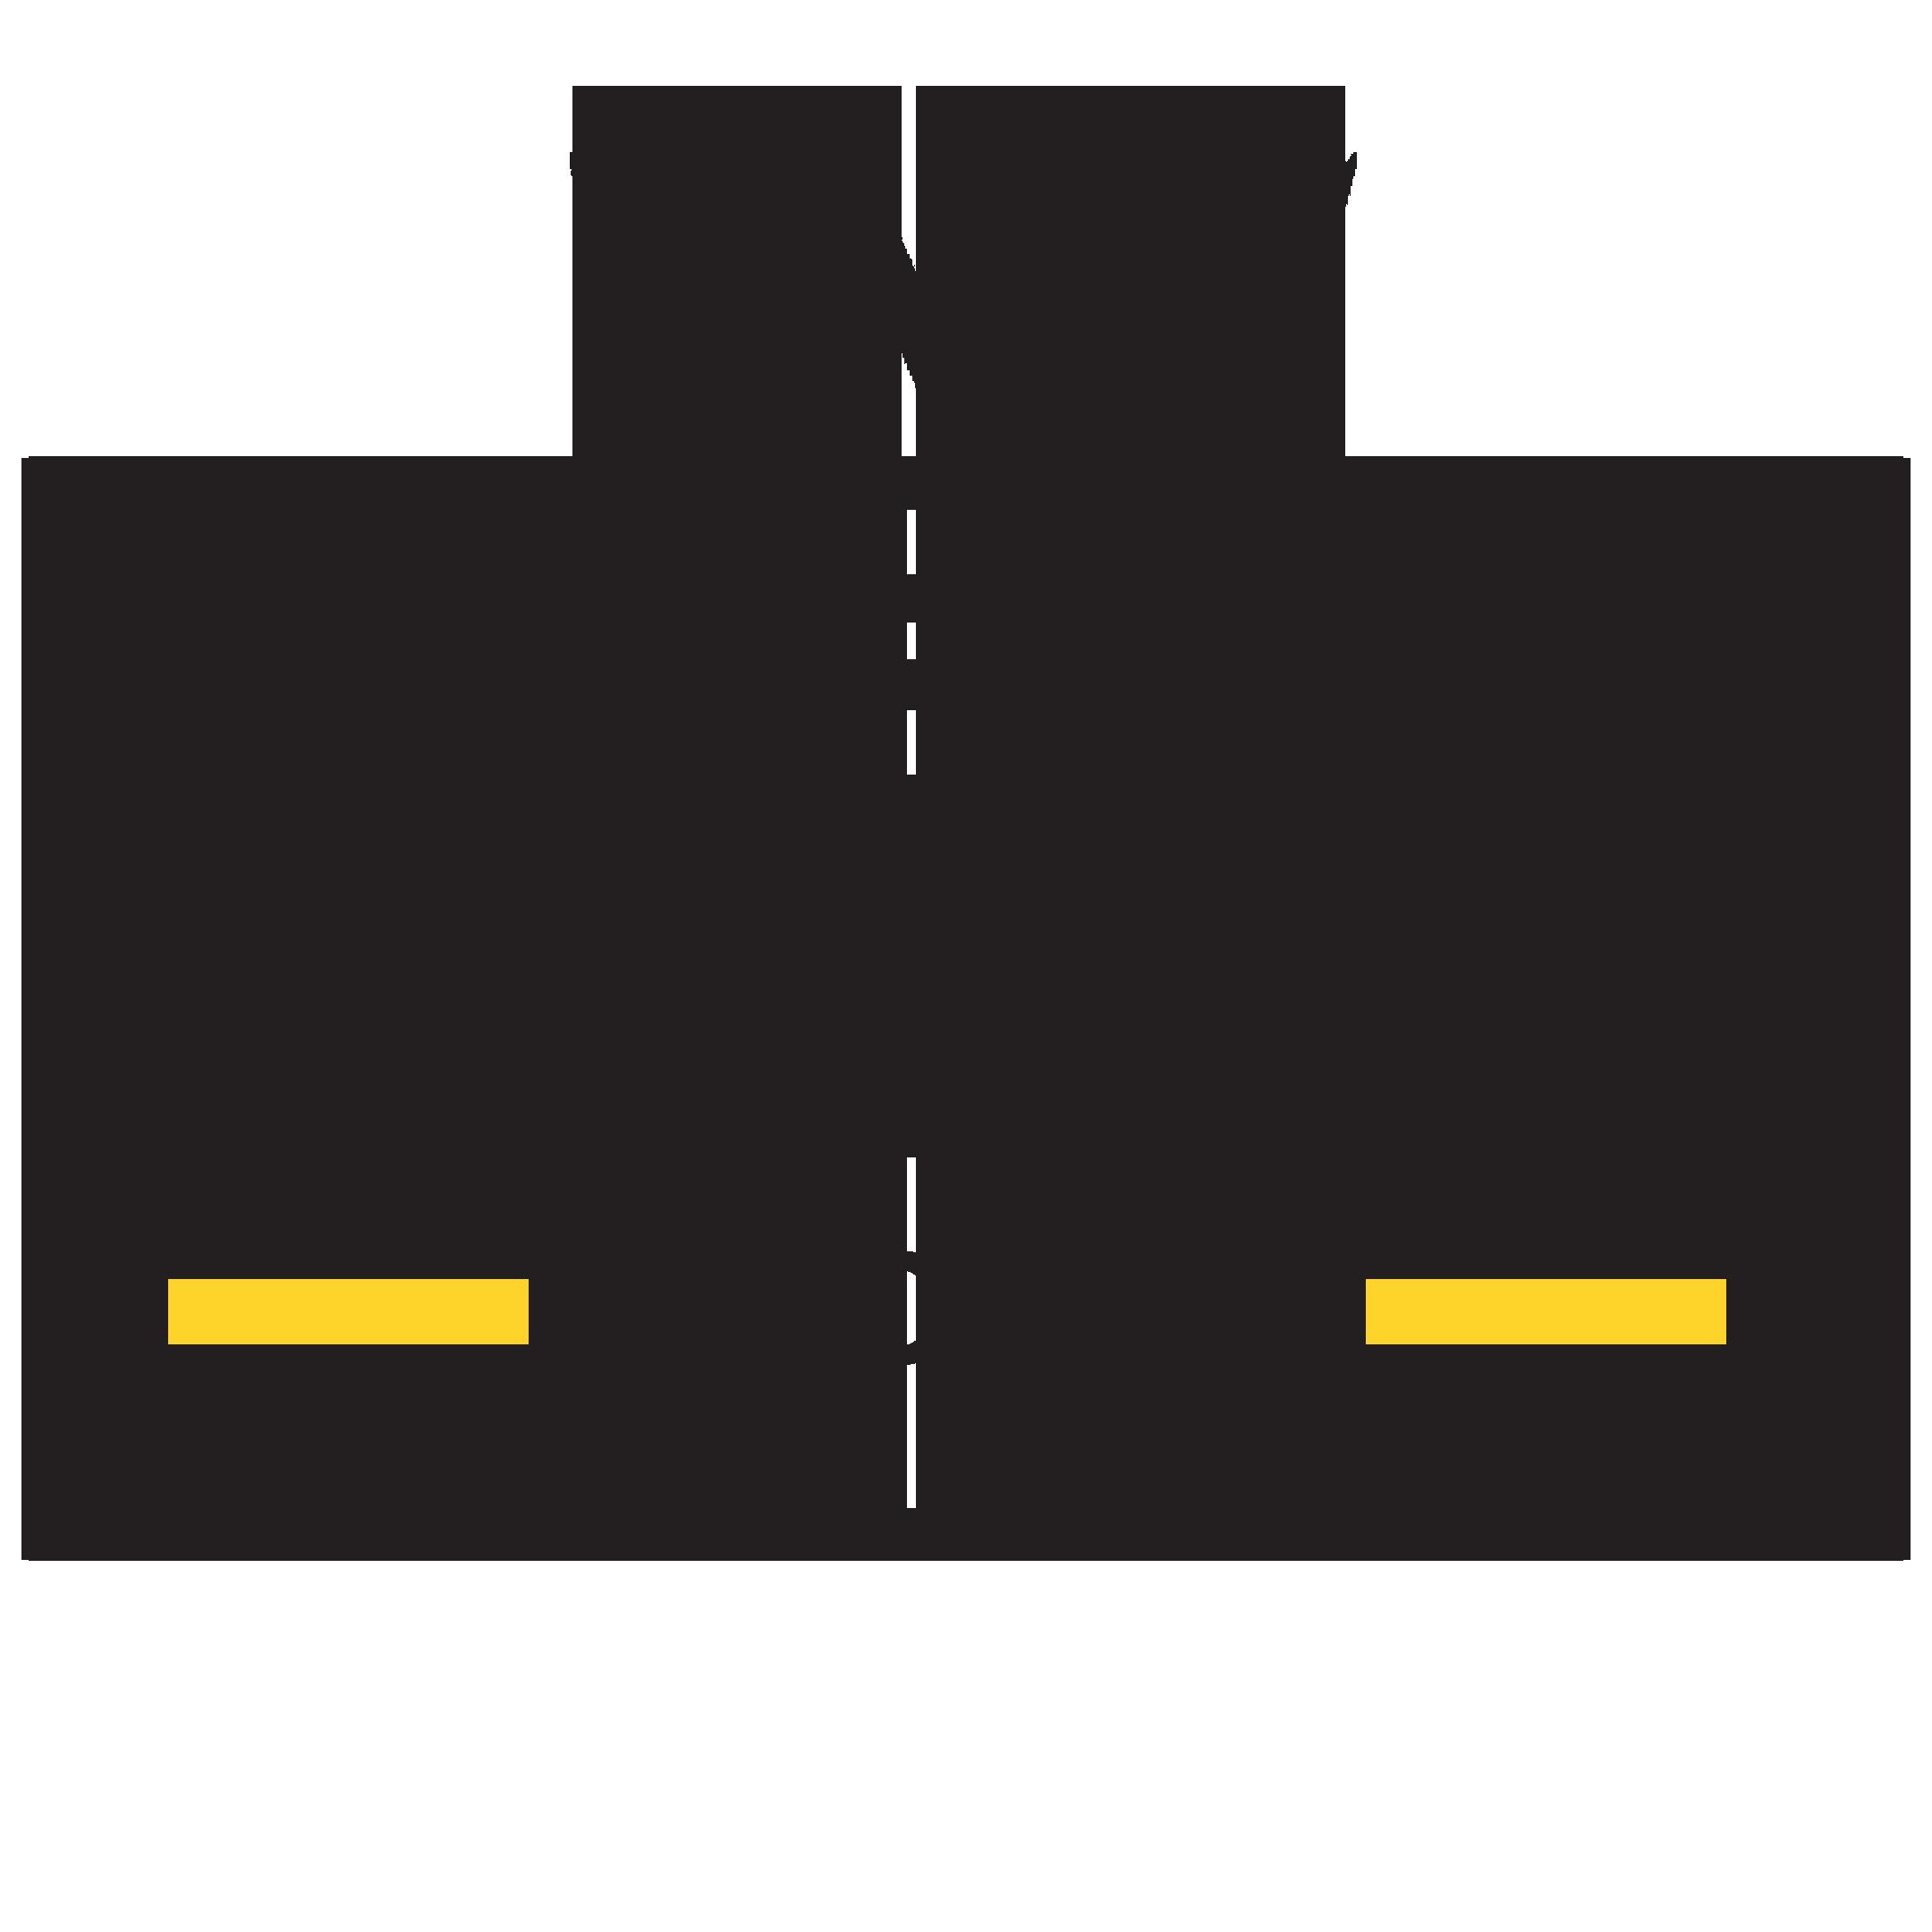 2019 Underground Session Mortal Kombat 11